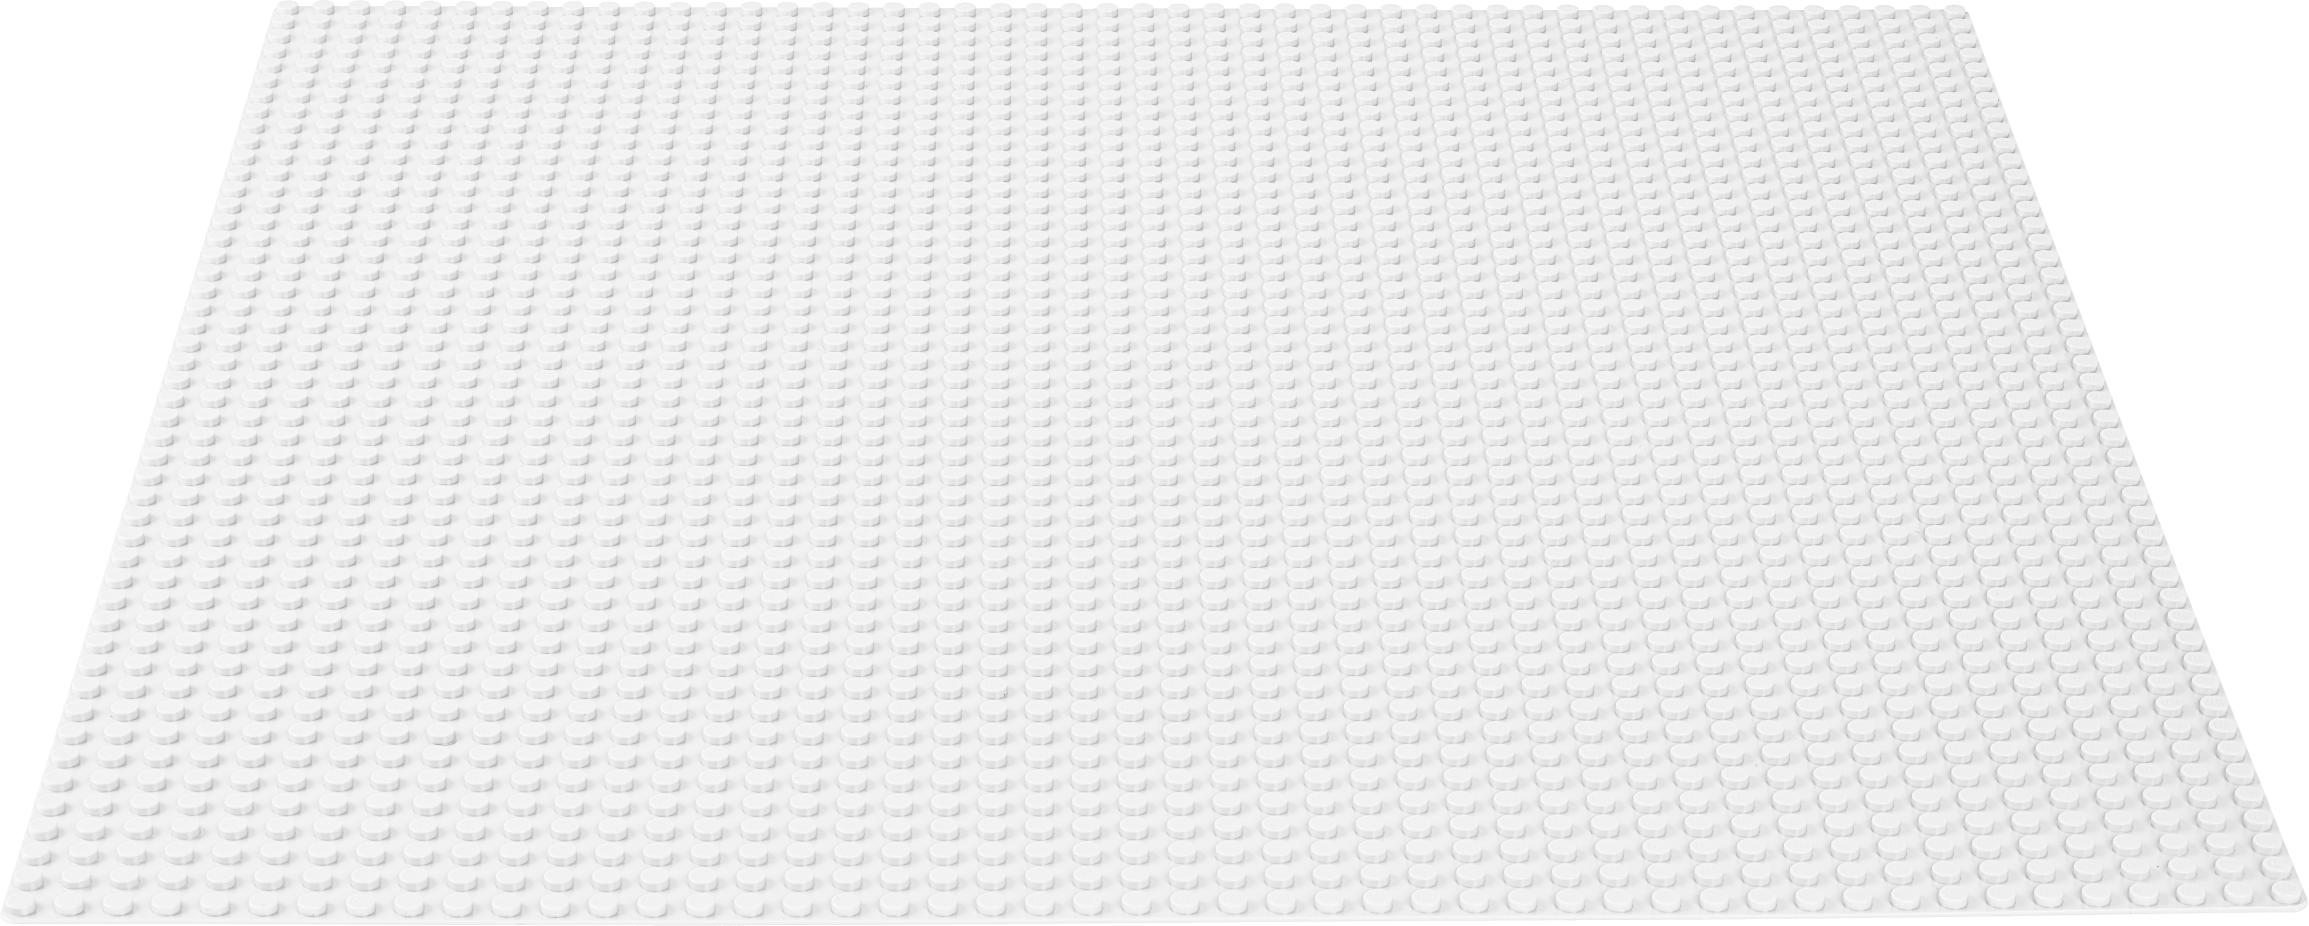 White baseplate